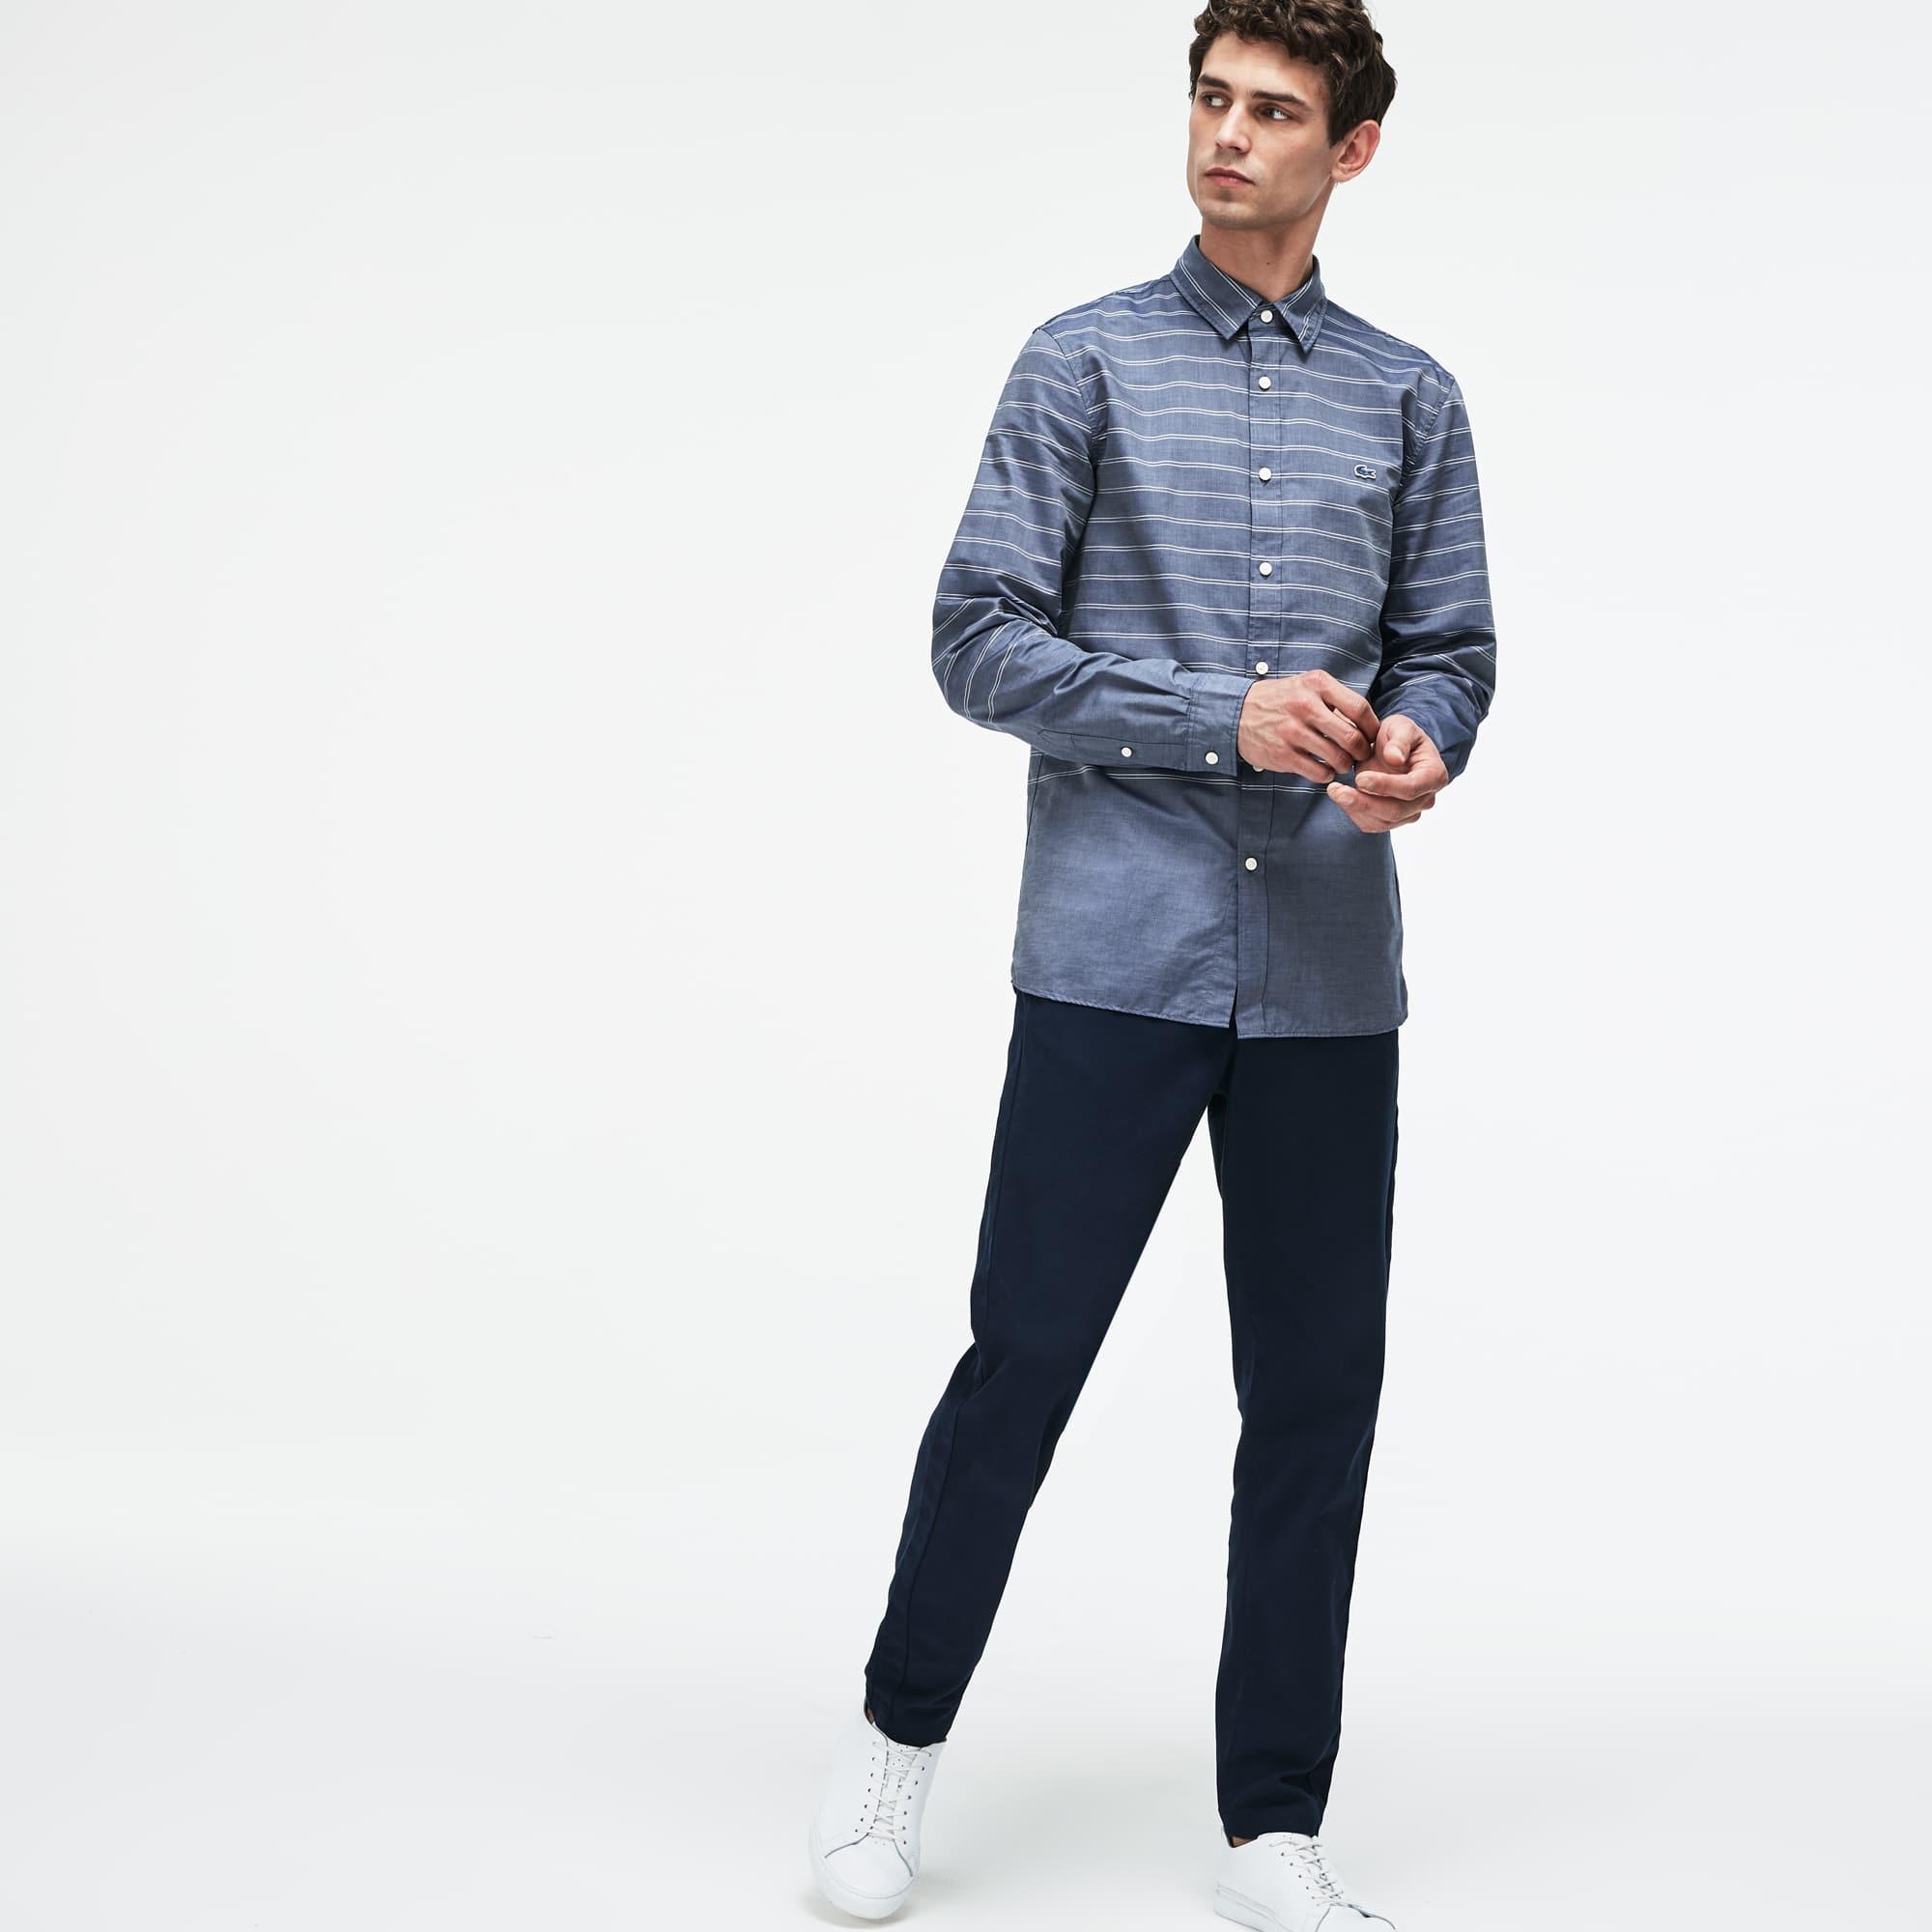 Herren Slim Fit Hemd aus gestreiftem Popeline LACOSTE MOTION